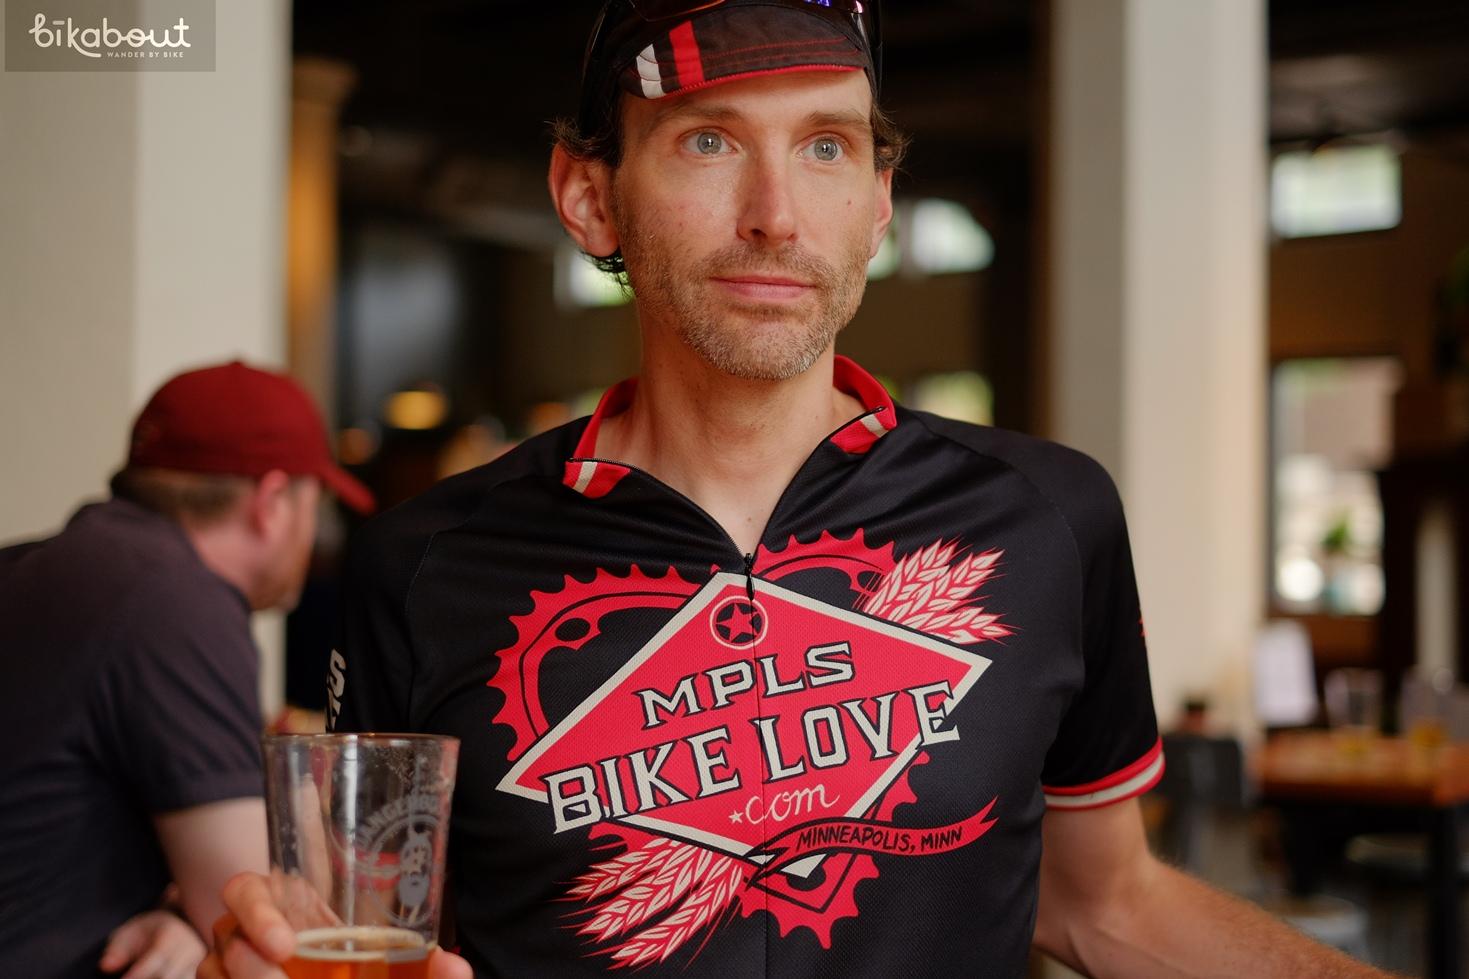 Route curator, Ben McCoy of MPLS Bike Love